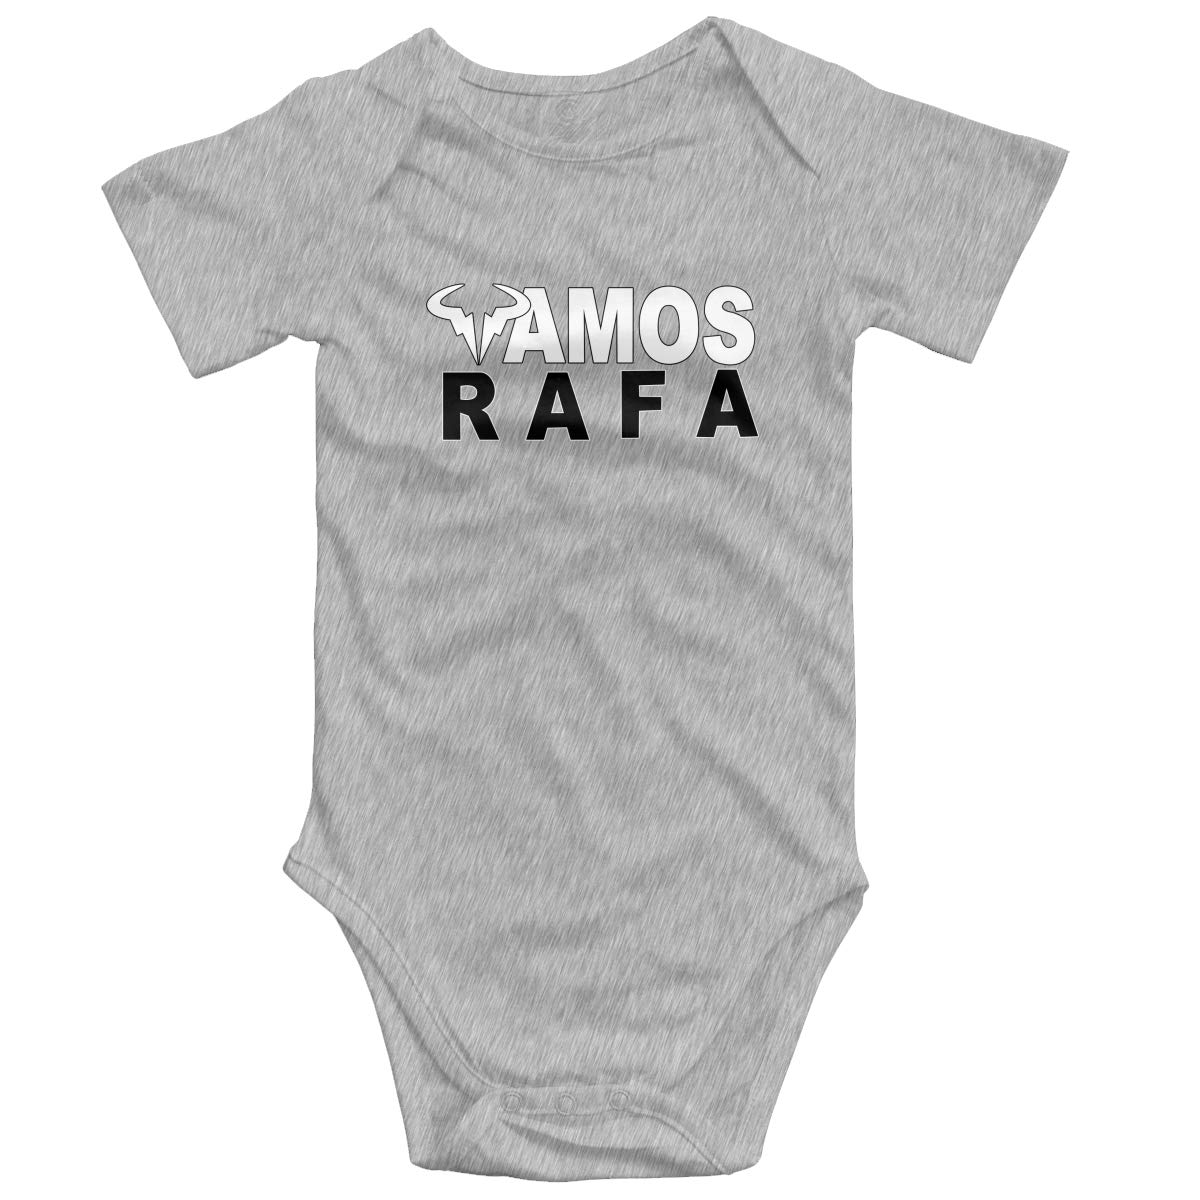 Koucas Baby Girls Boys RAFA Vamos Rafael Nadal Logo Kids Bodysuits Short Sleeve Cotton Tshirt T Shirt Tollder Clothes Gray 6M by Koucas